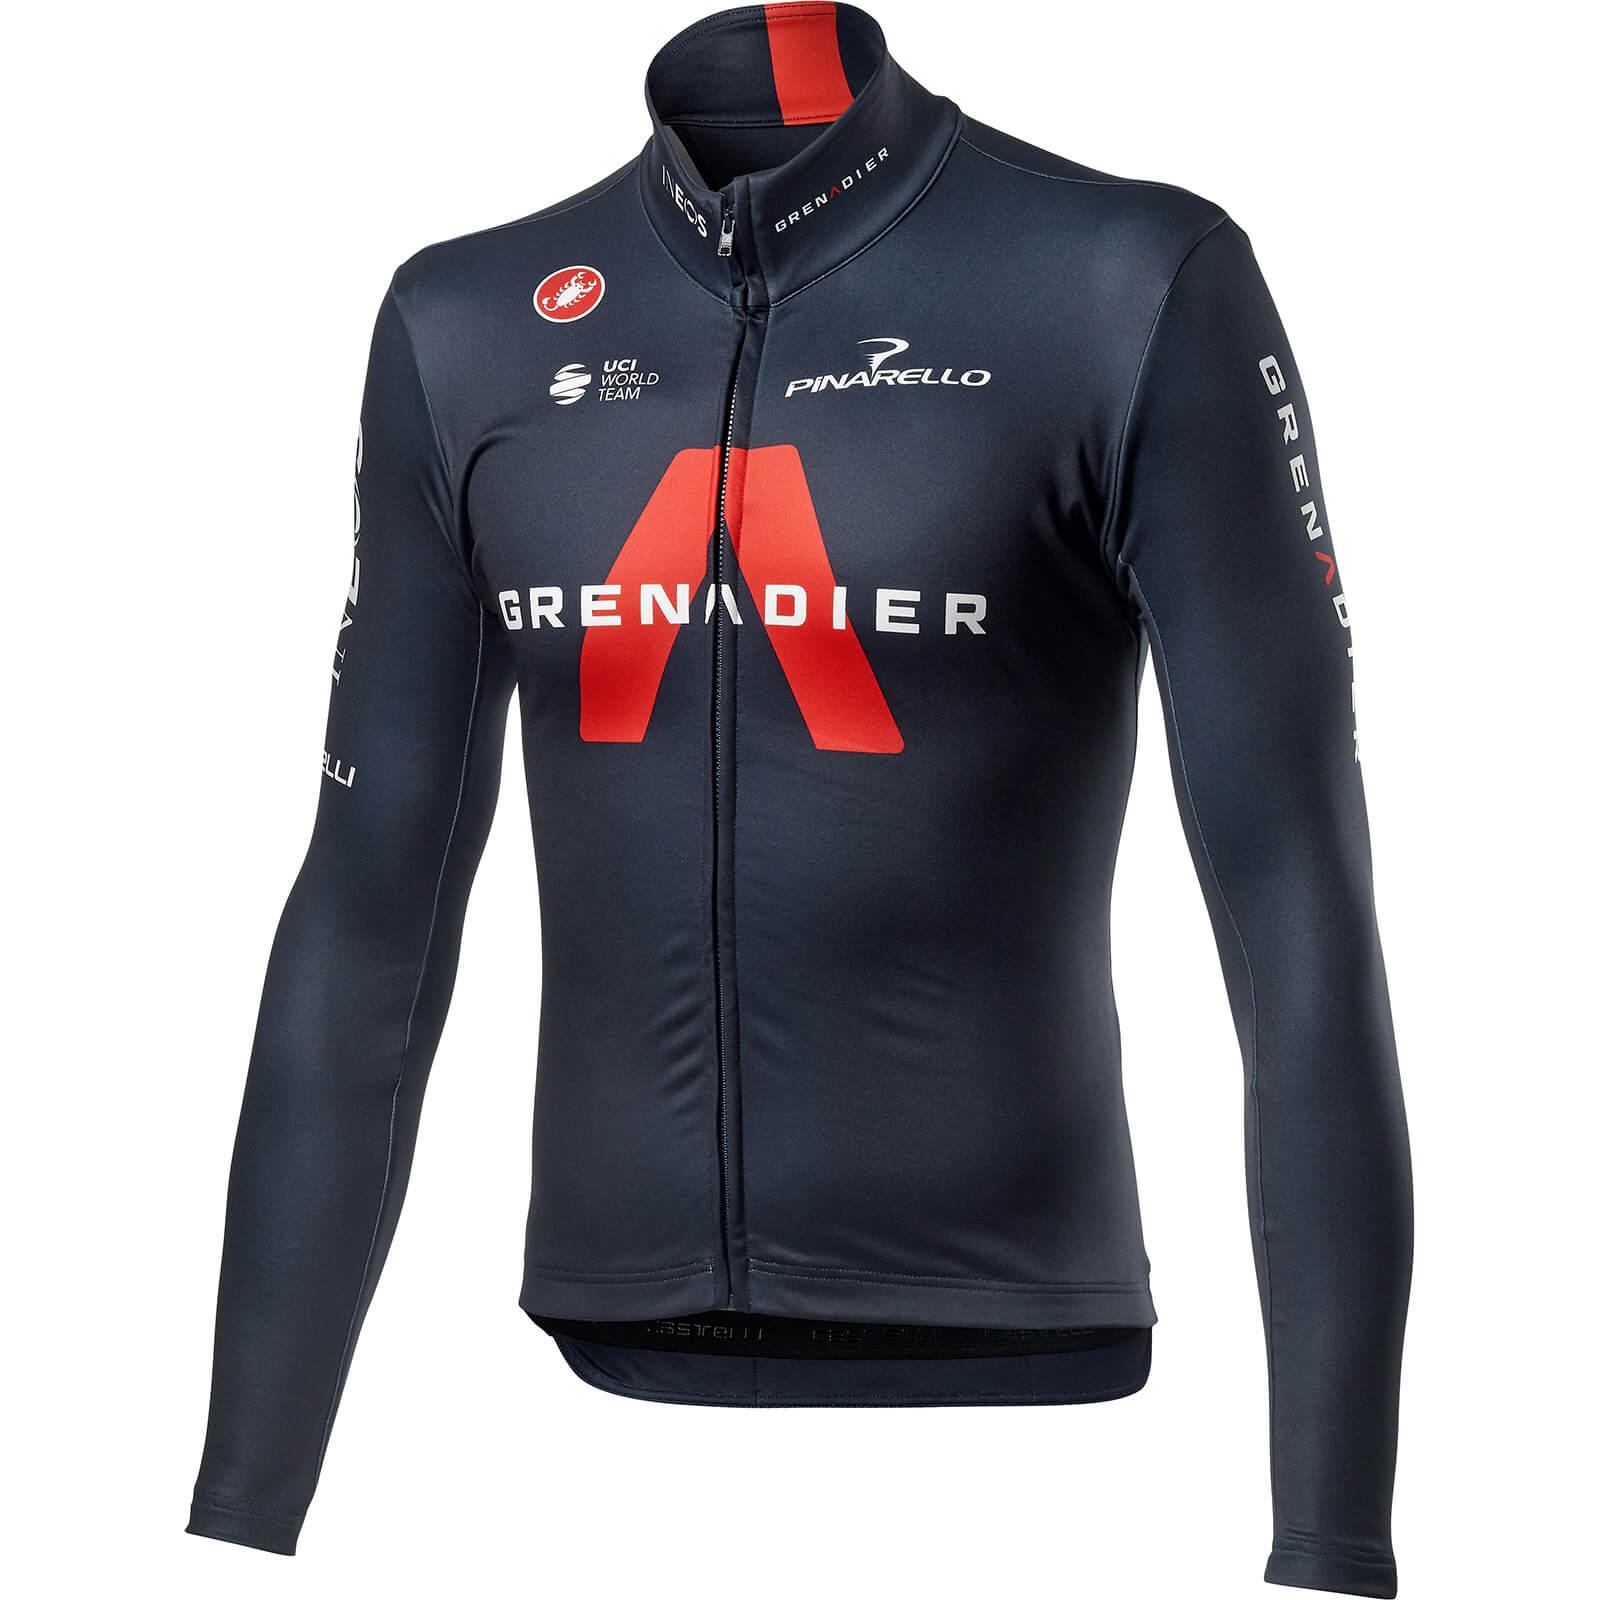 Castelli Team Inoes Grenadier LS Thermal Jersey - S; male